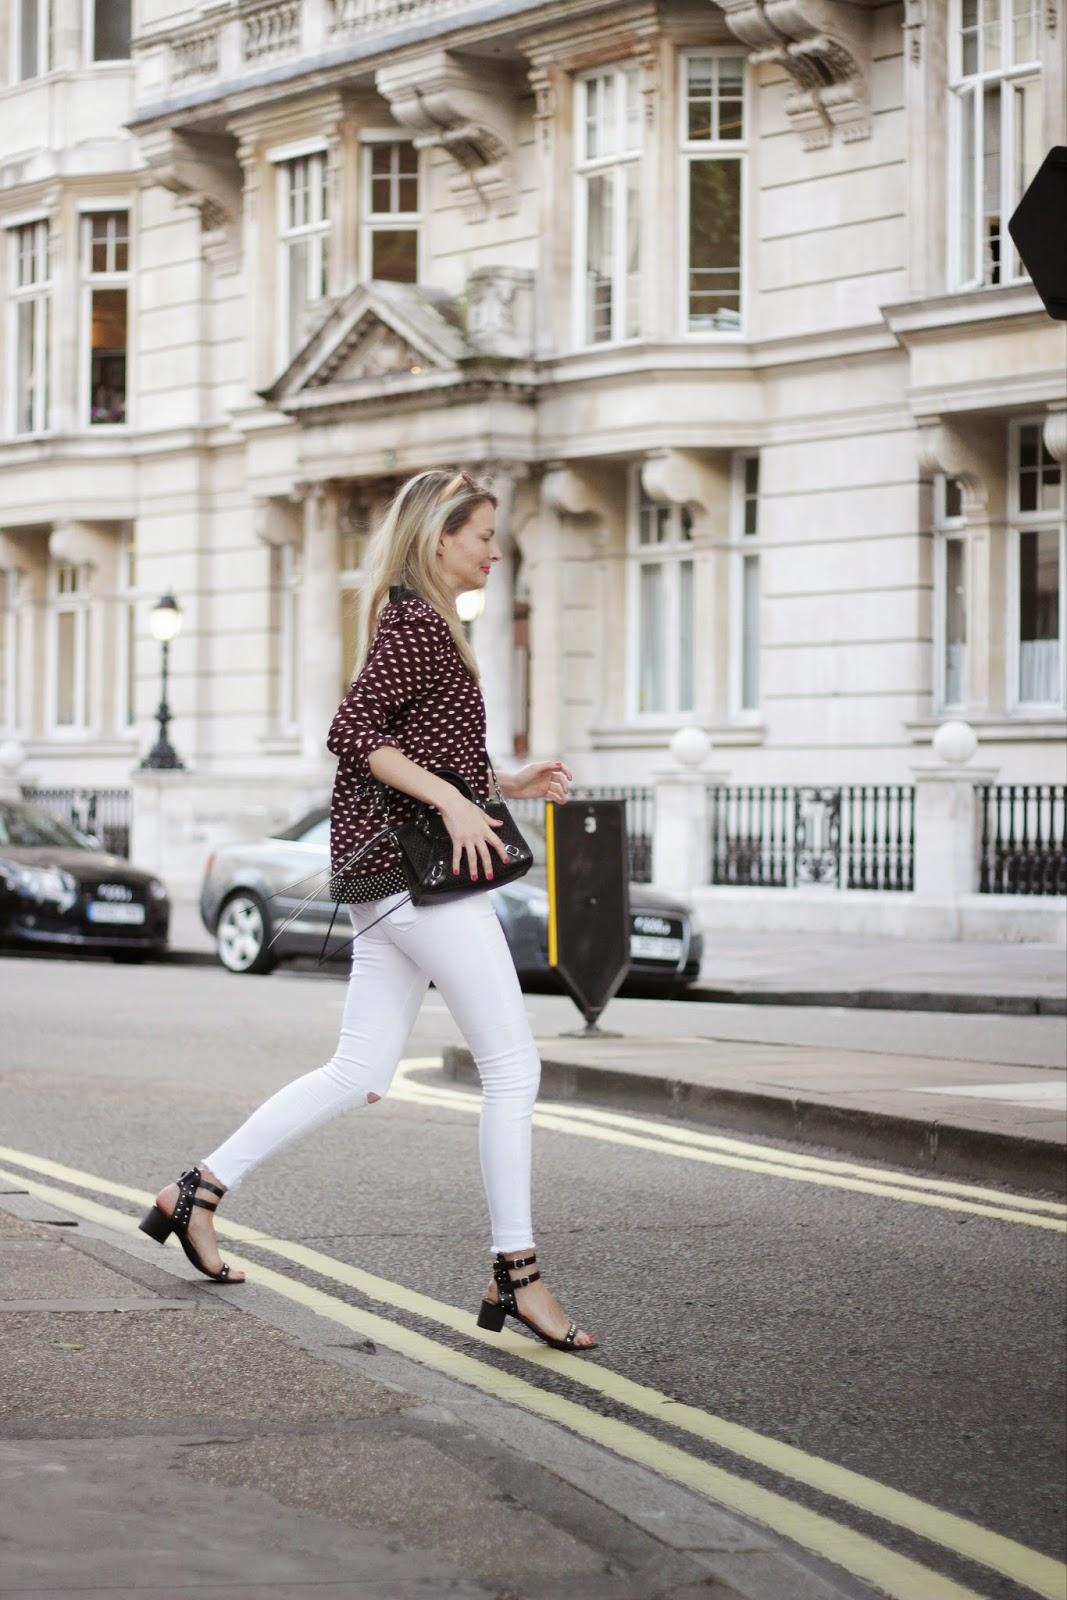 Asos jeans, white asos jeans, white jeans, white skinny jeans, asos ridley jeans, kurt geiger, kurt geiger sandals, isabel marant inspired sandals, street style, london street style, balenciaga, balenciaga mini city bag